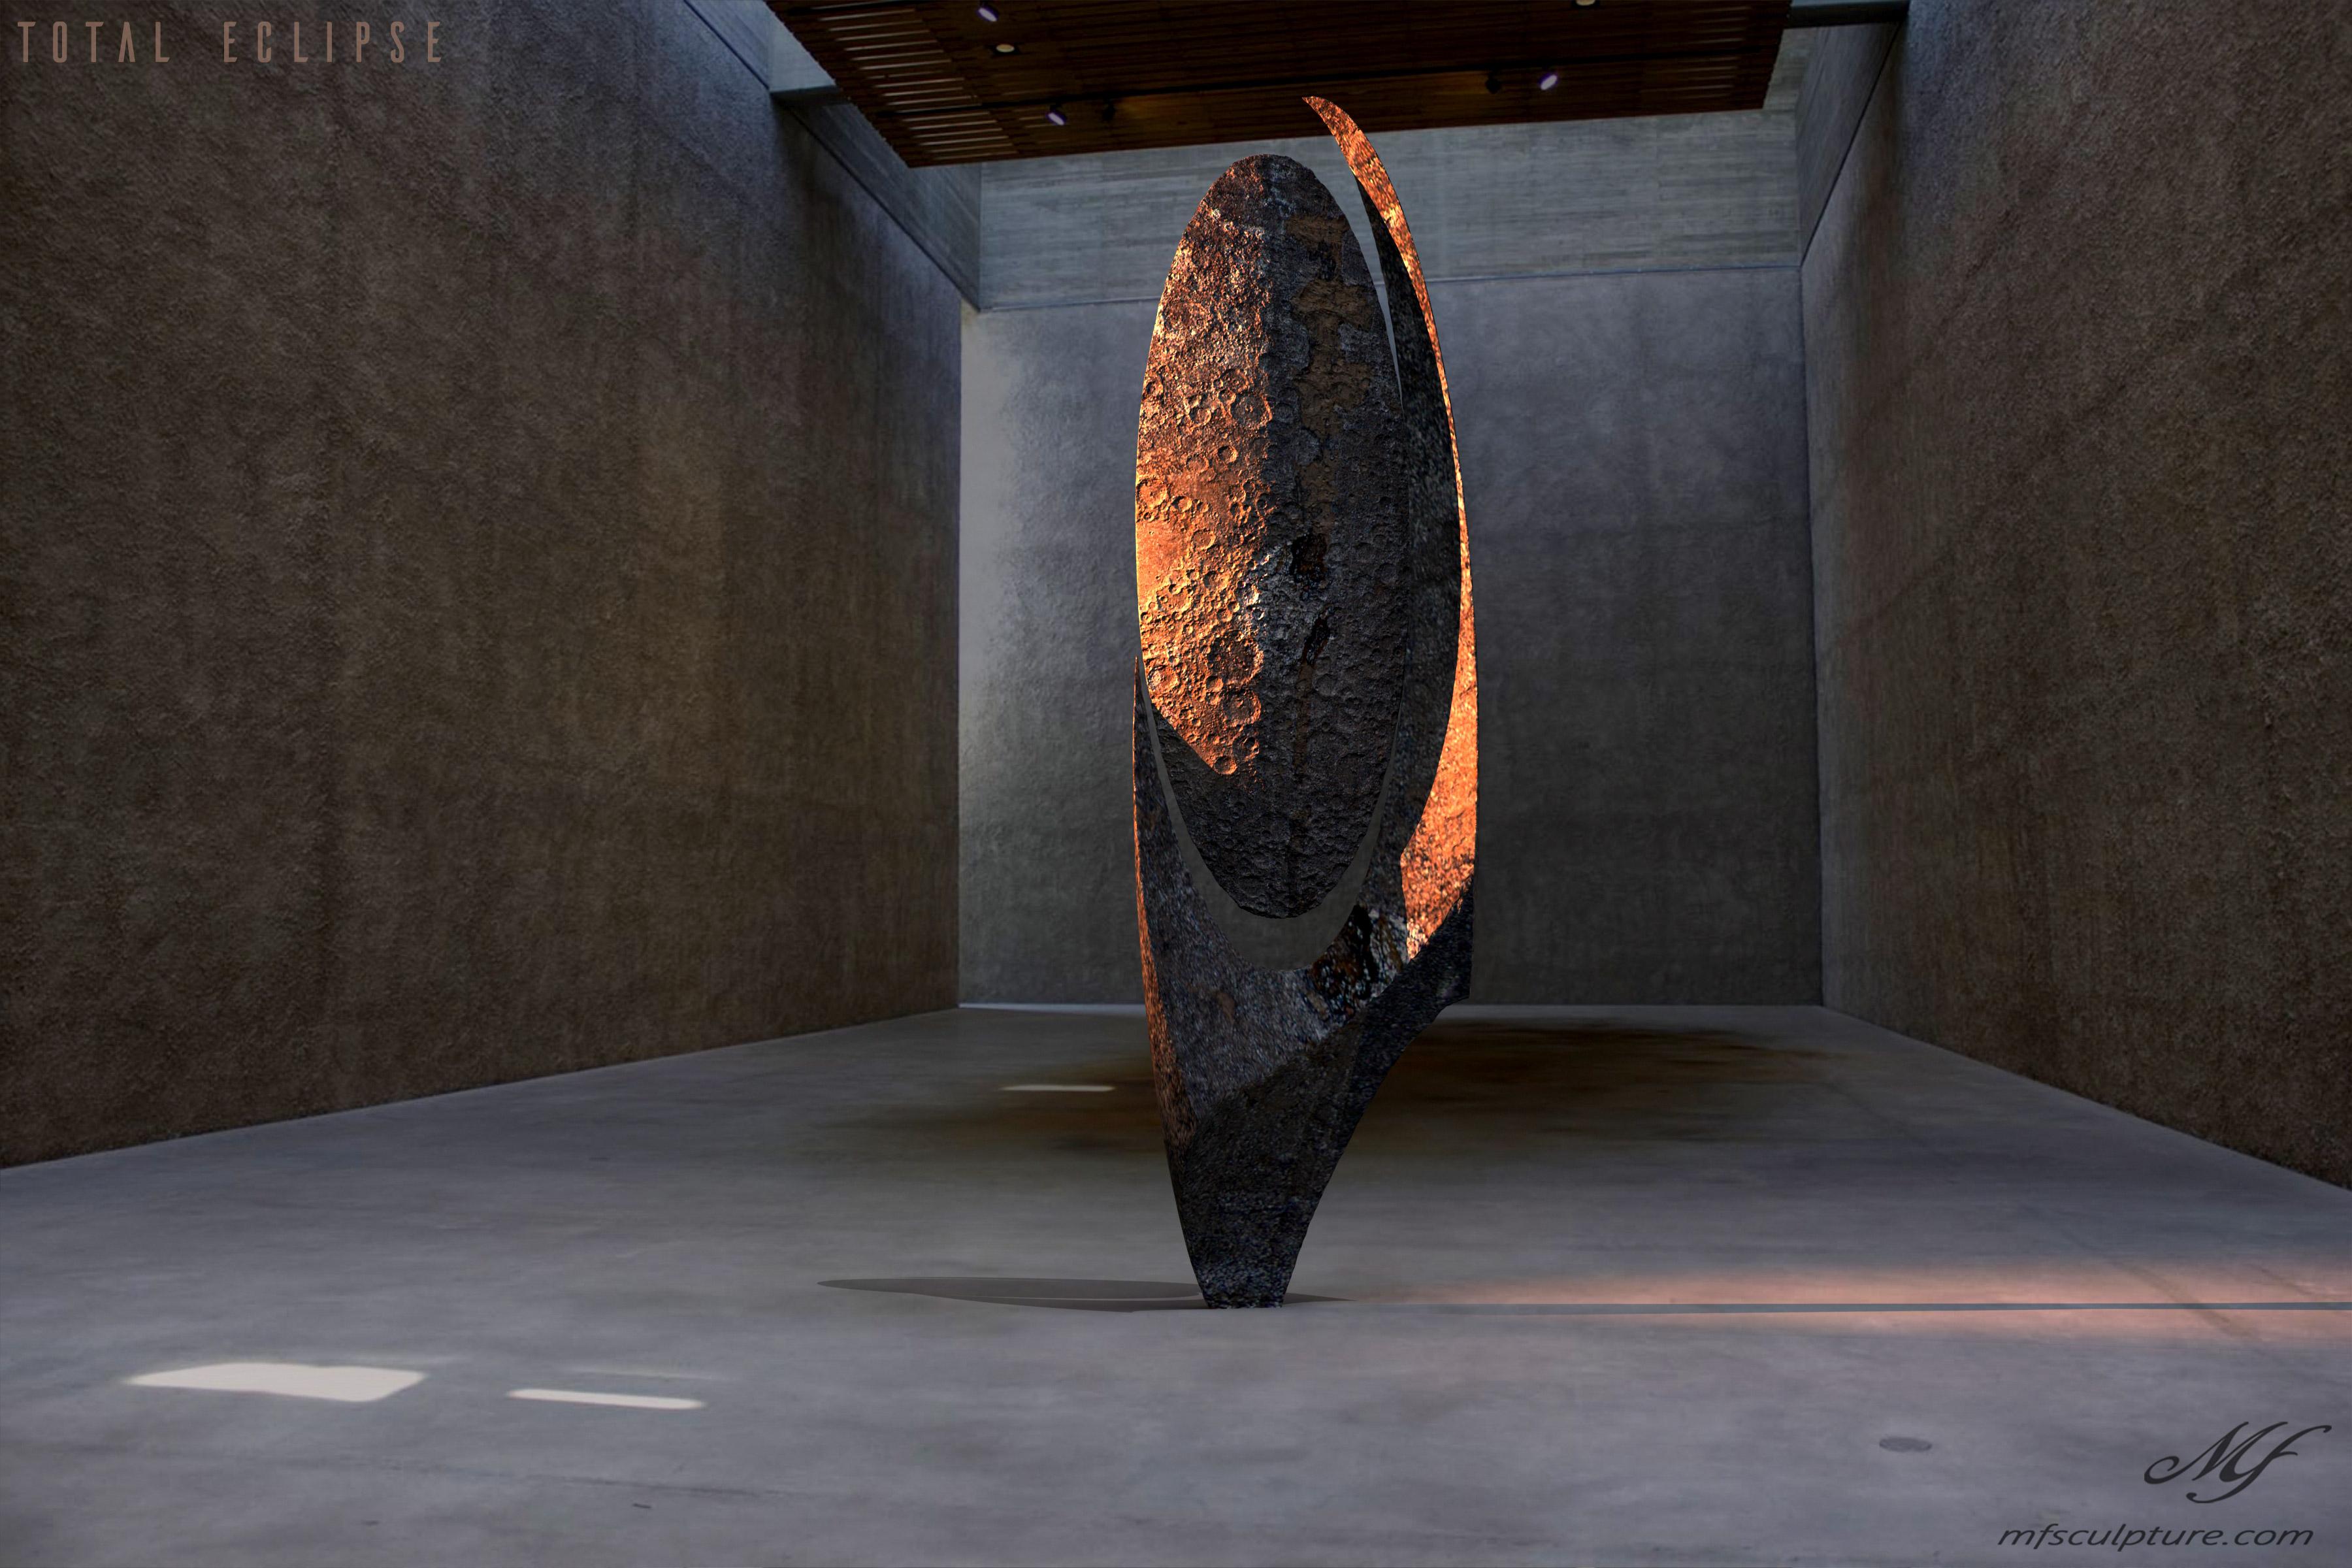 Konig Galerie Koenig Gallery Contemporary Sculpture Art Total Eclipse Moon 2